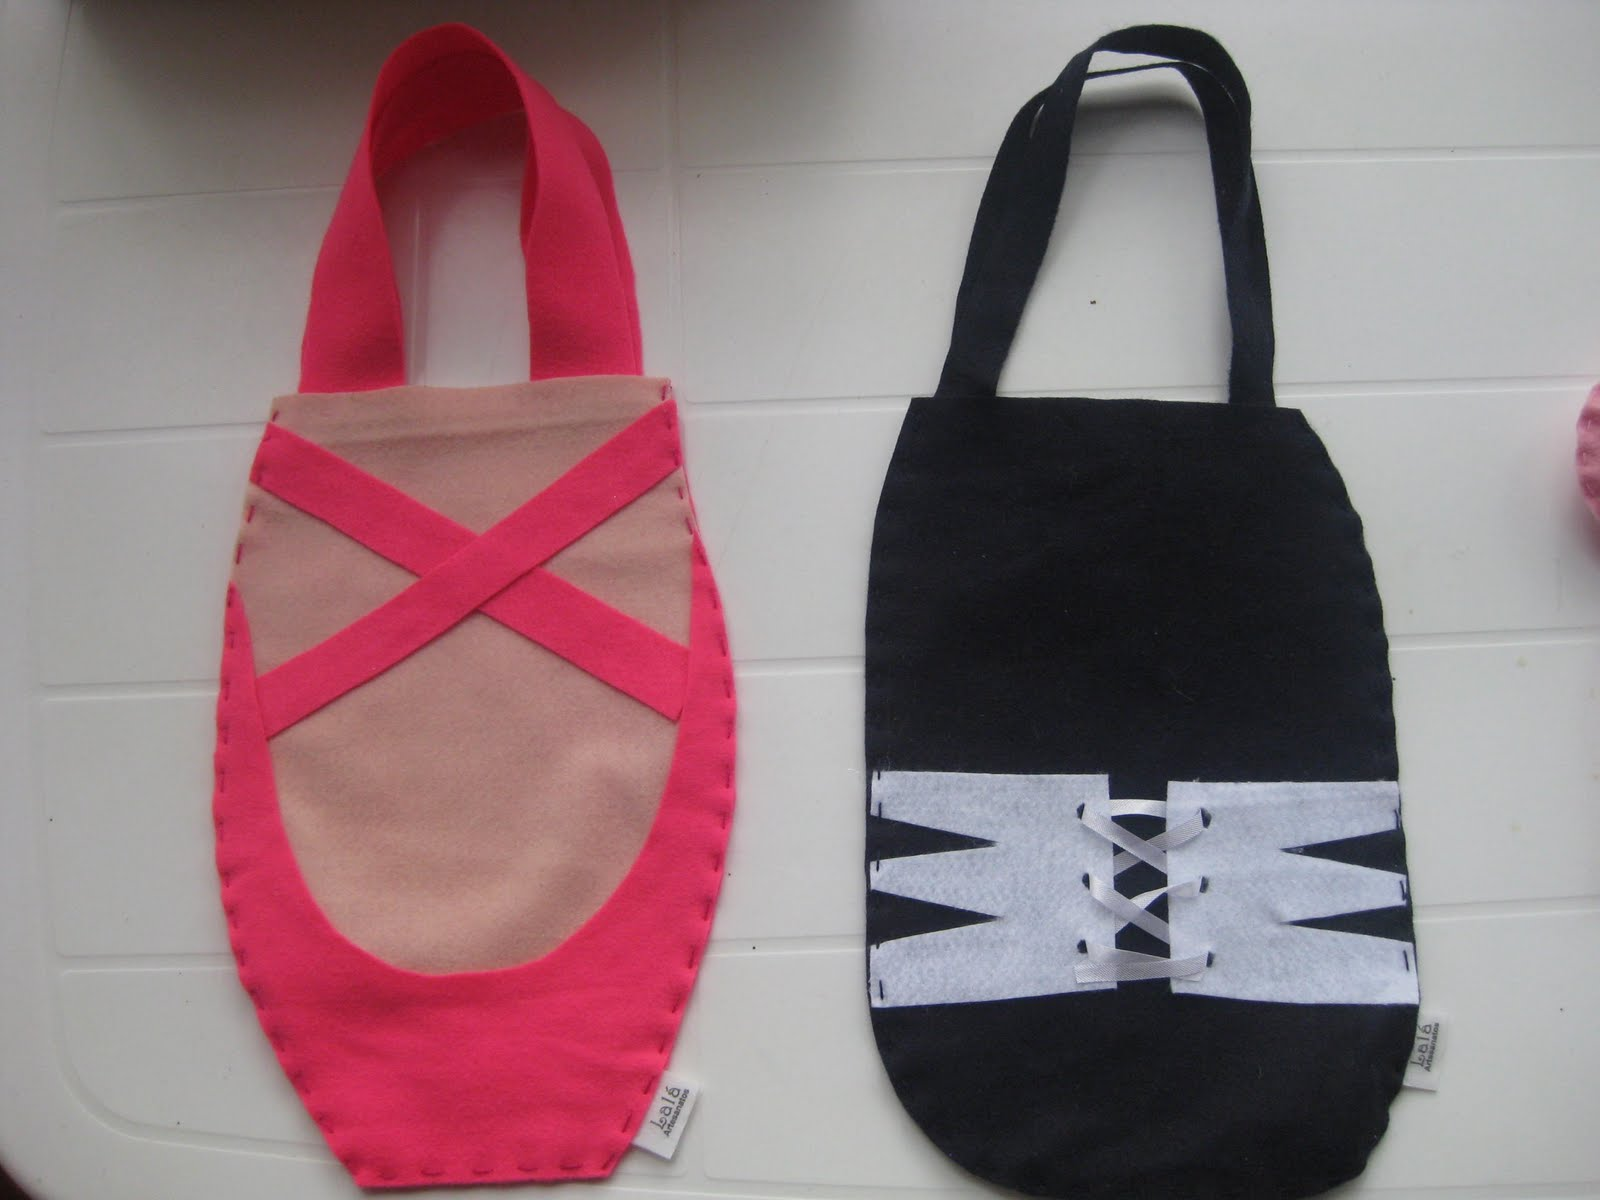 092f540ab6305 sacola de sapatilha para as meninas  sacola de chuteira para os meninos